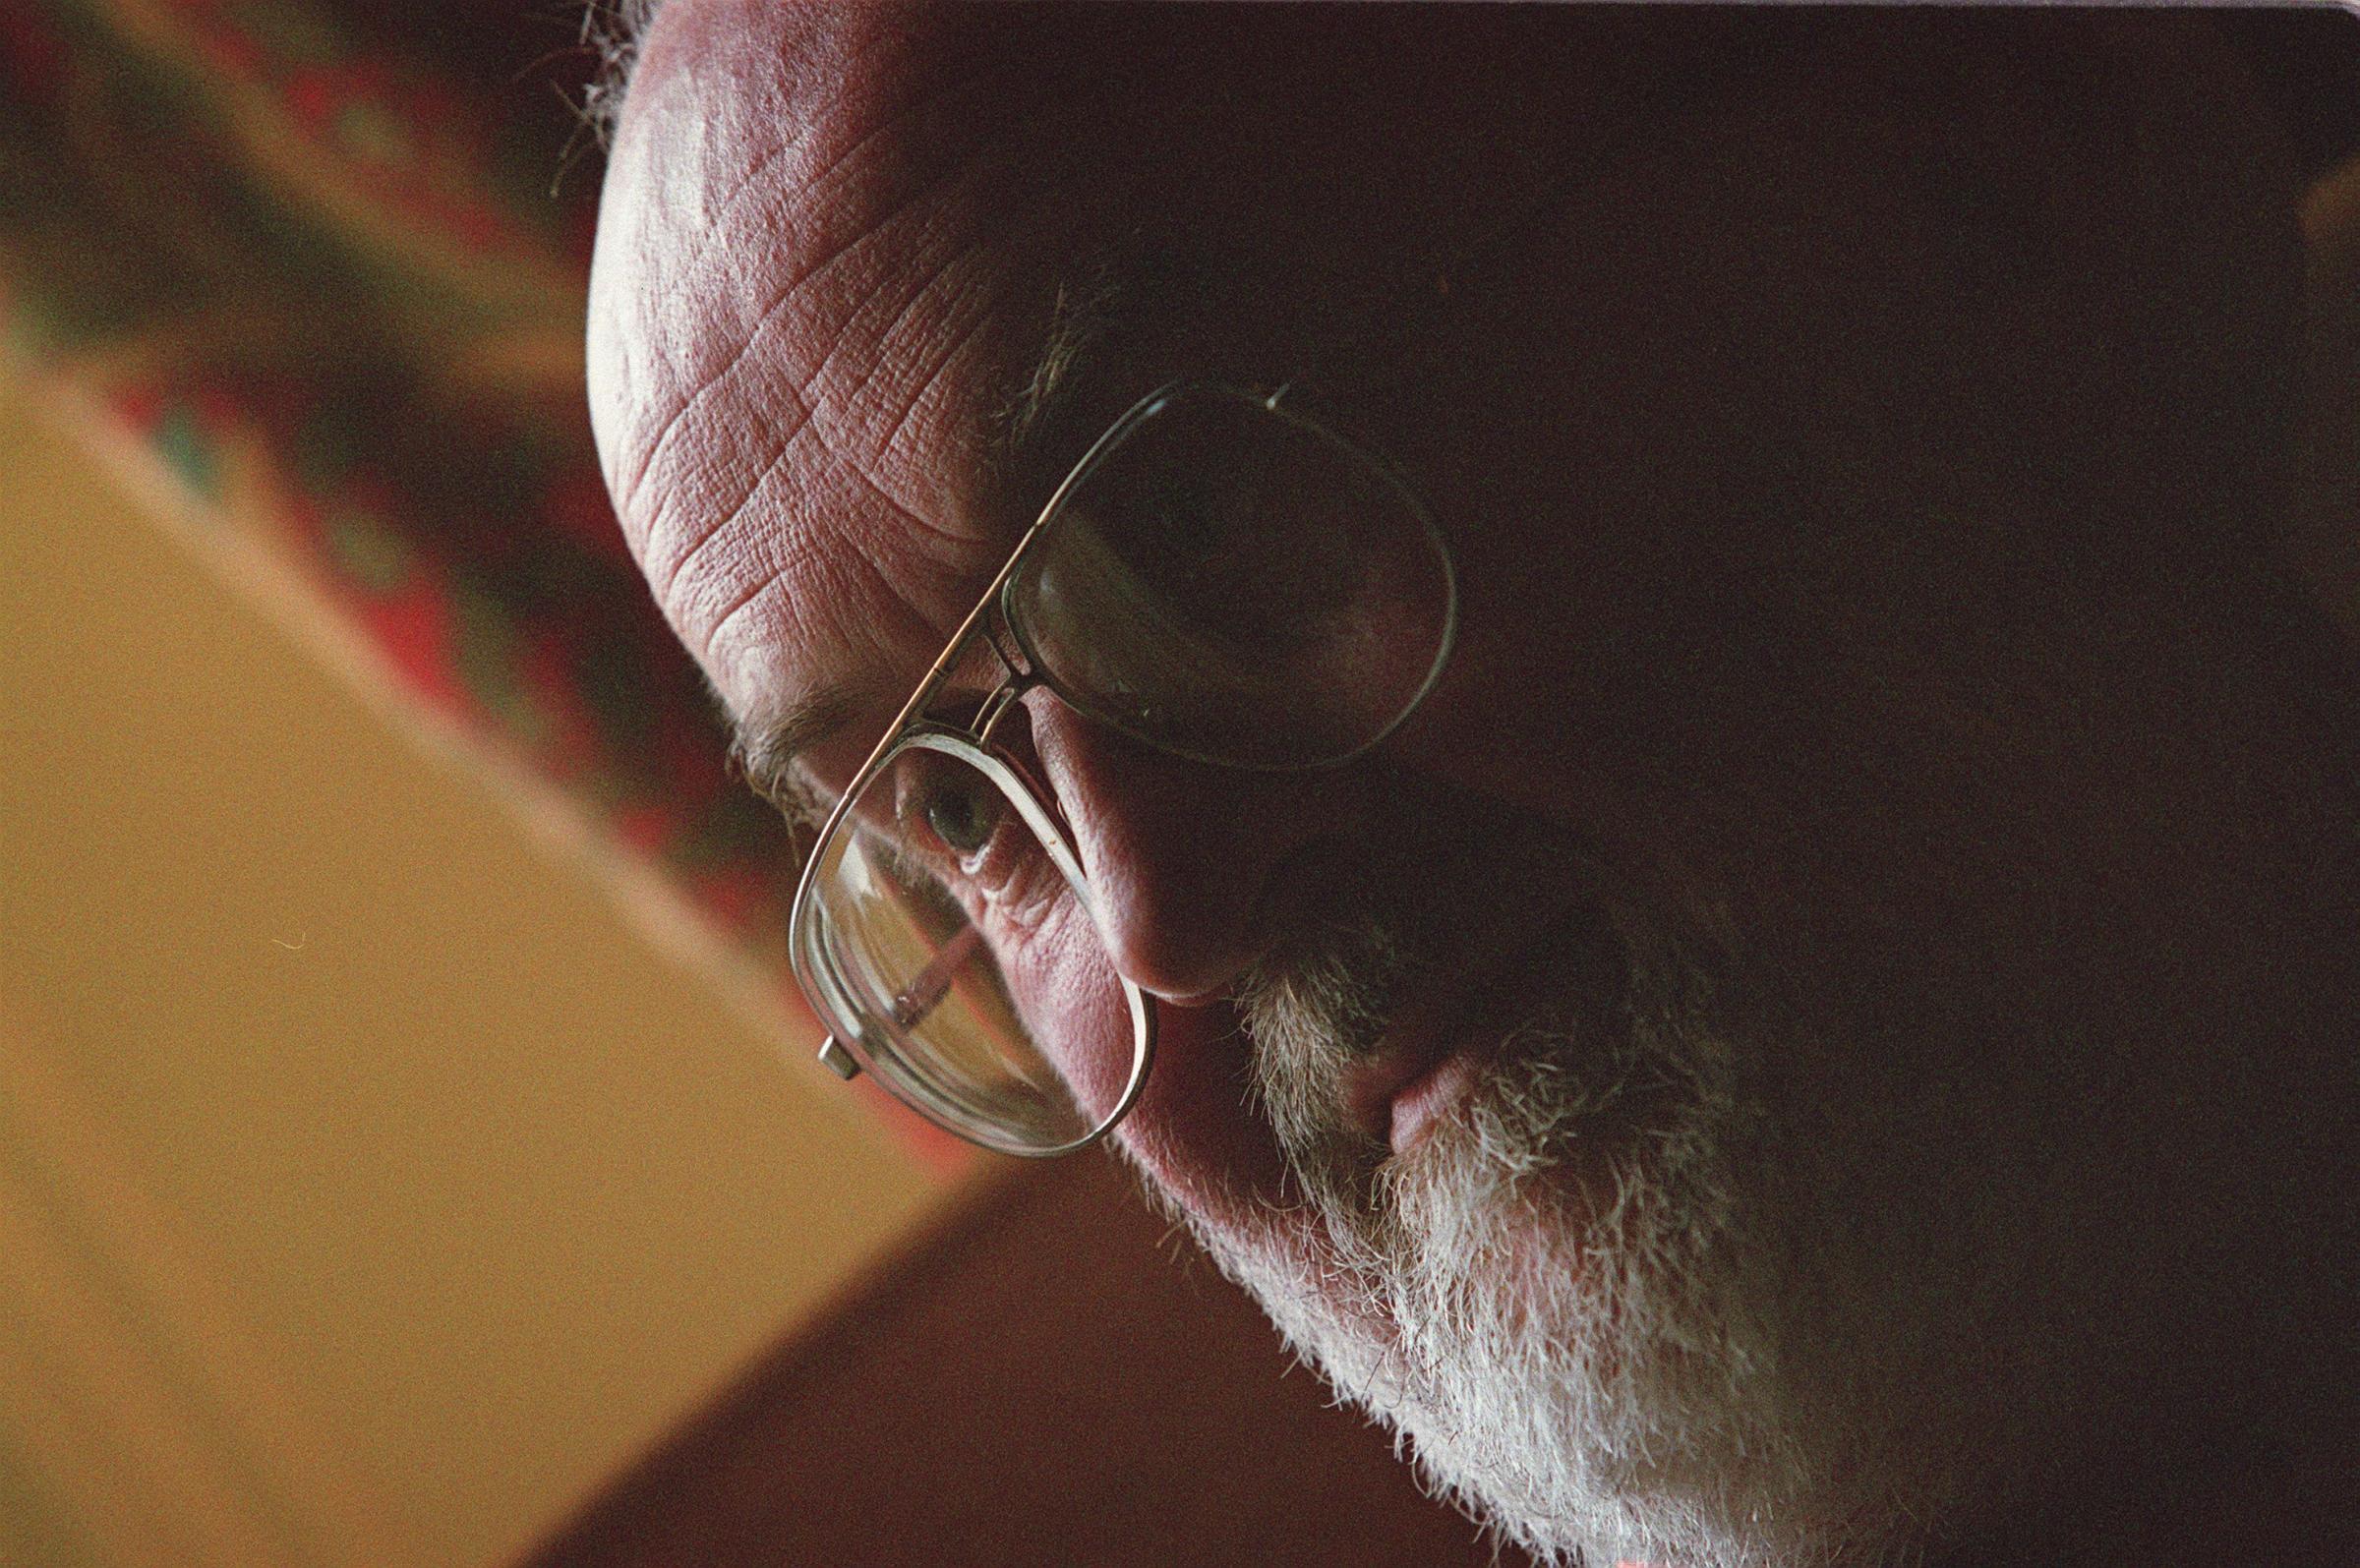 Alan Draper, of In Care Abuse Survivors Scotland (Incas)